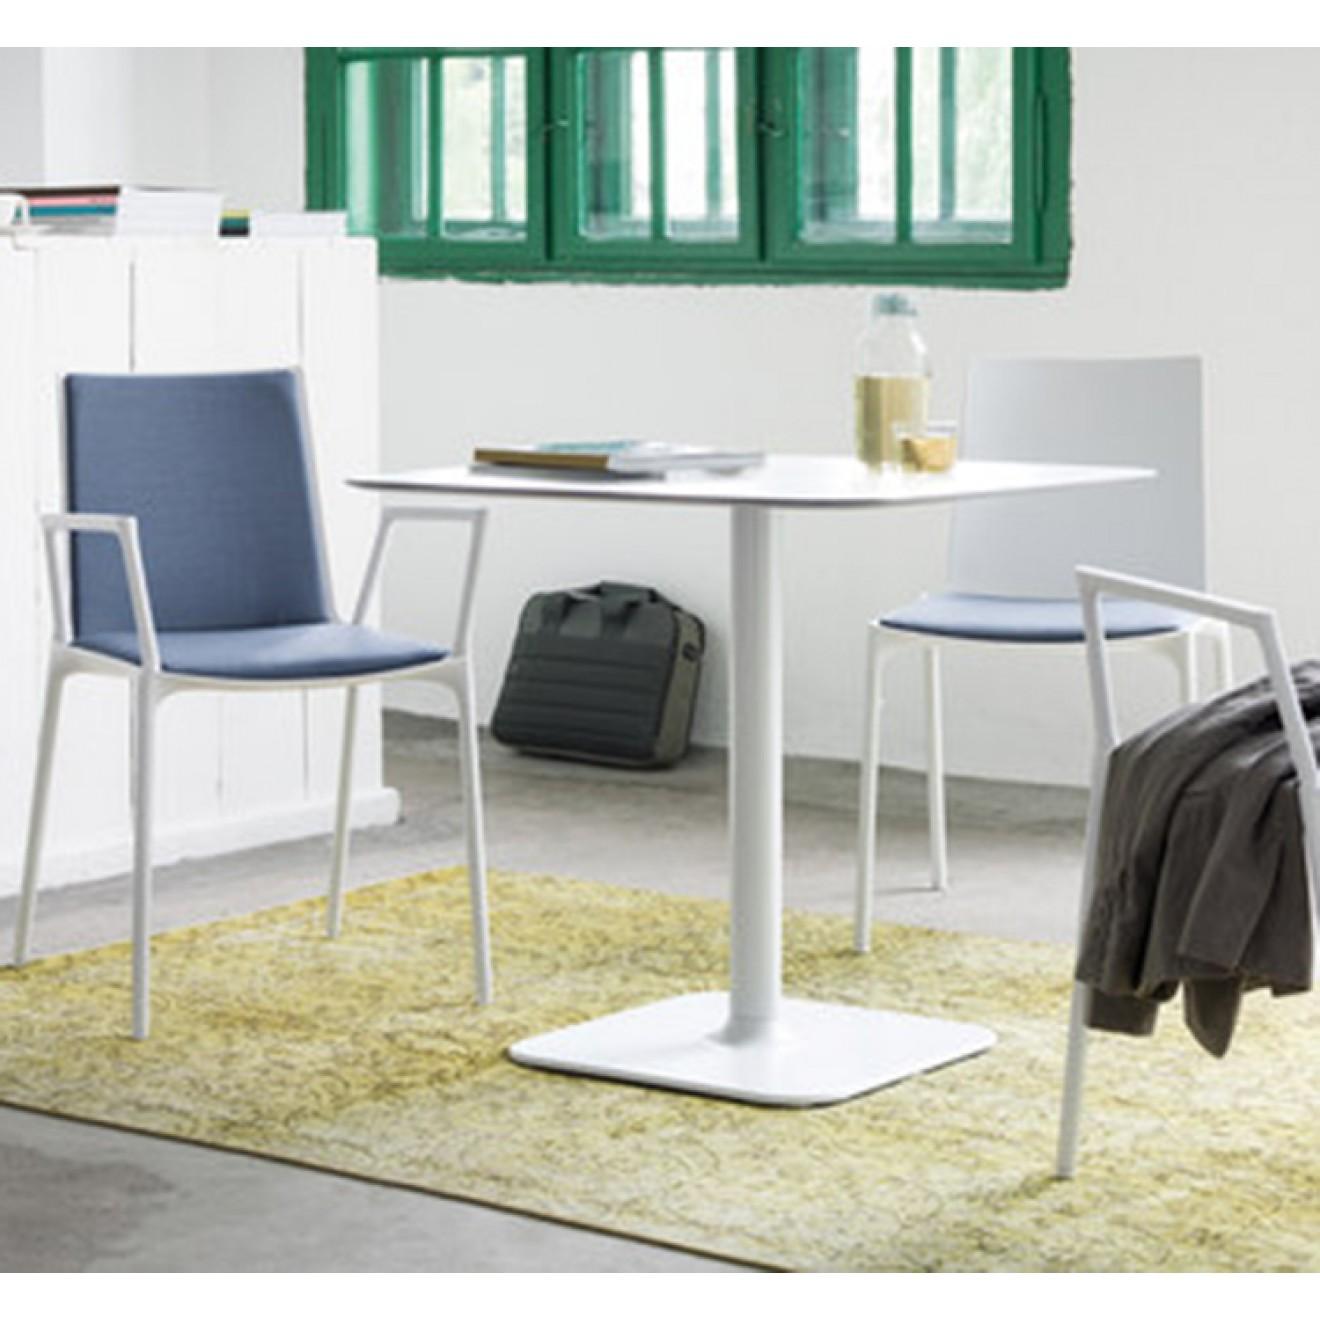 wiesner hager macao 3668 bistrotisch. Black Bedroom Furniture Sets. Home Design Ideas